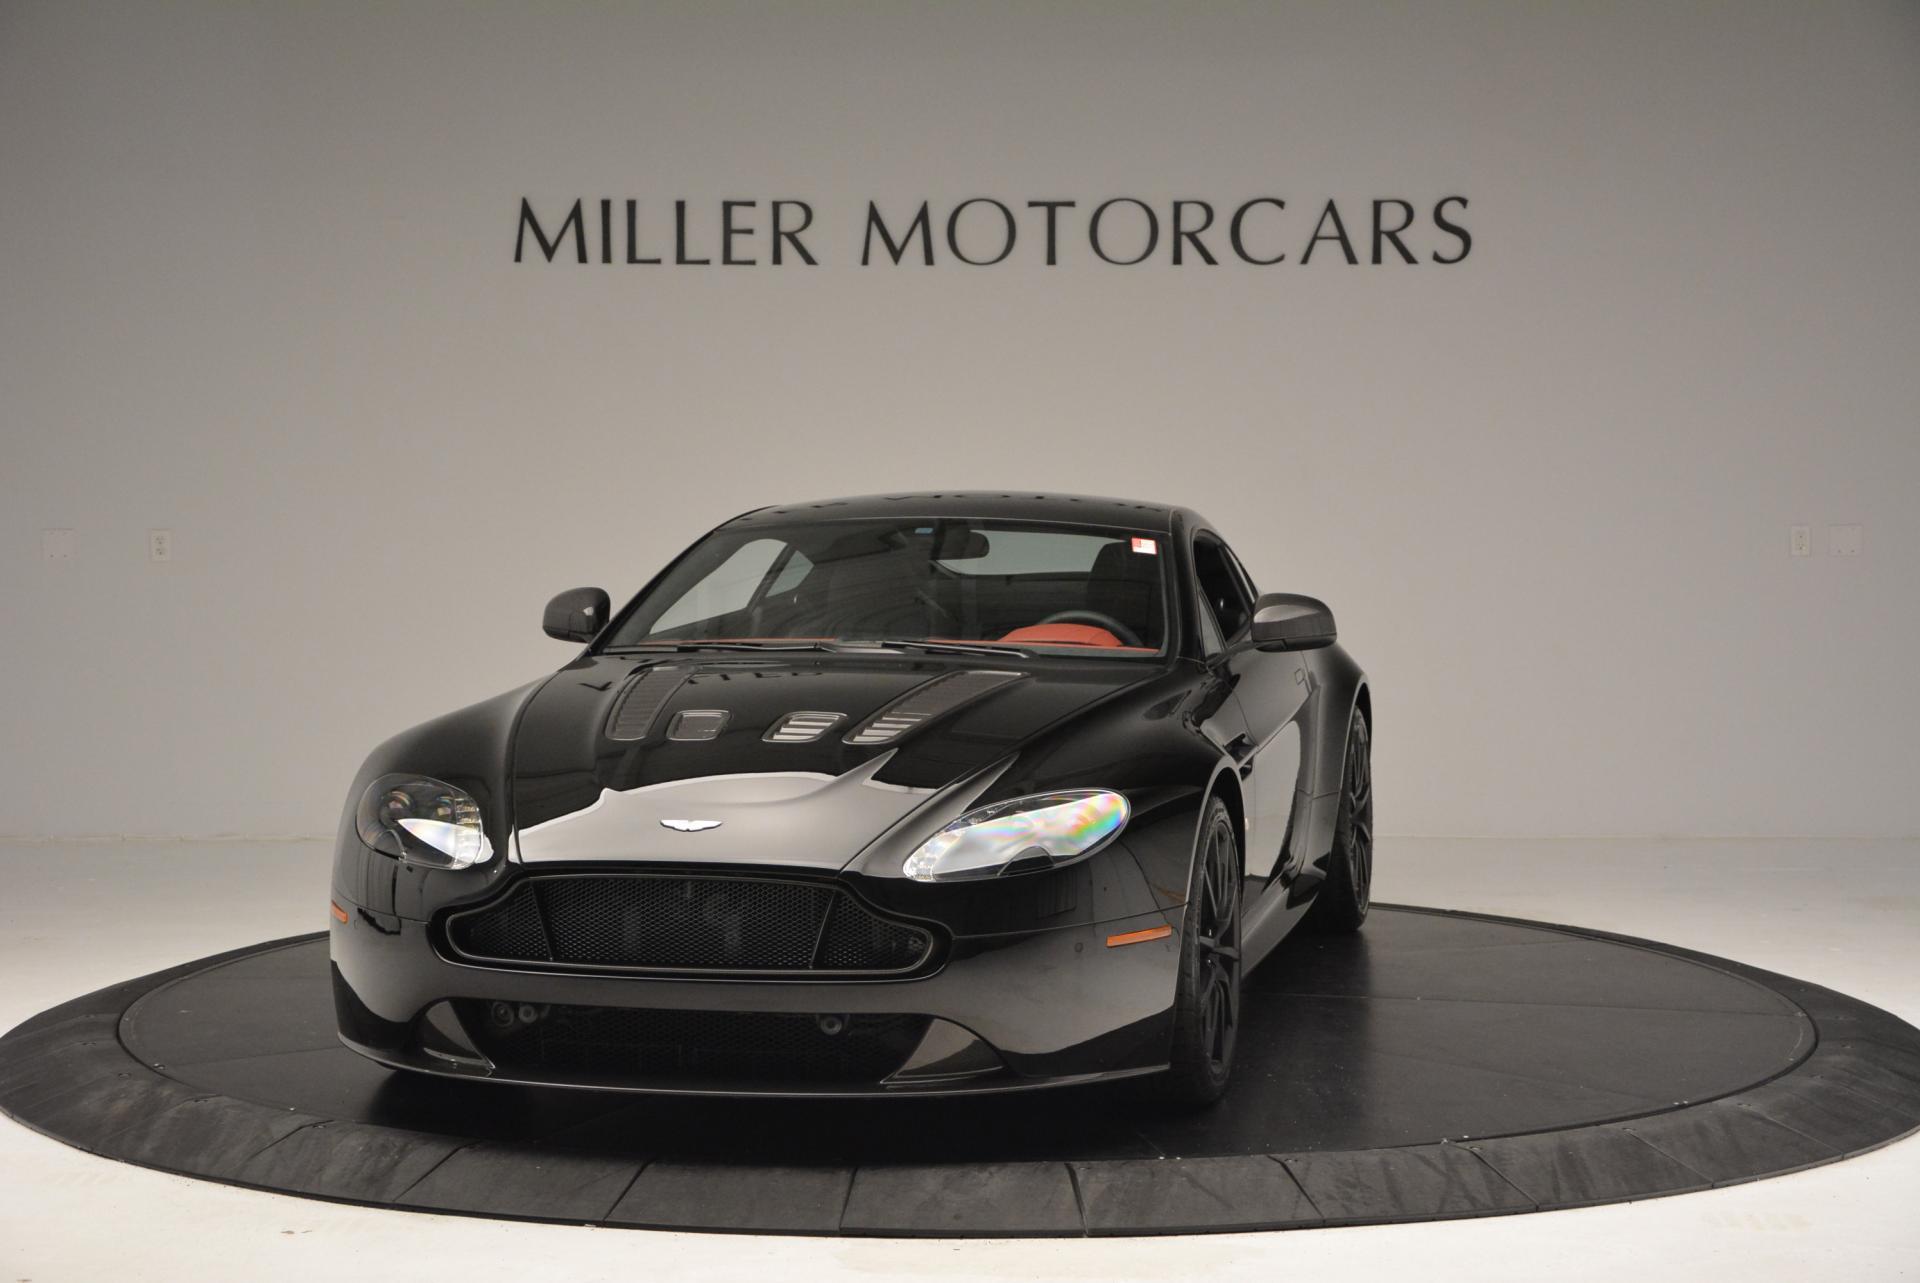 New 2015 Aston Martin V12 Vantage S  For Sale In Greenwich, CT 103_main